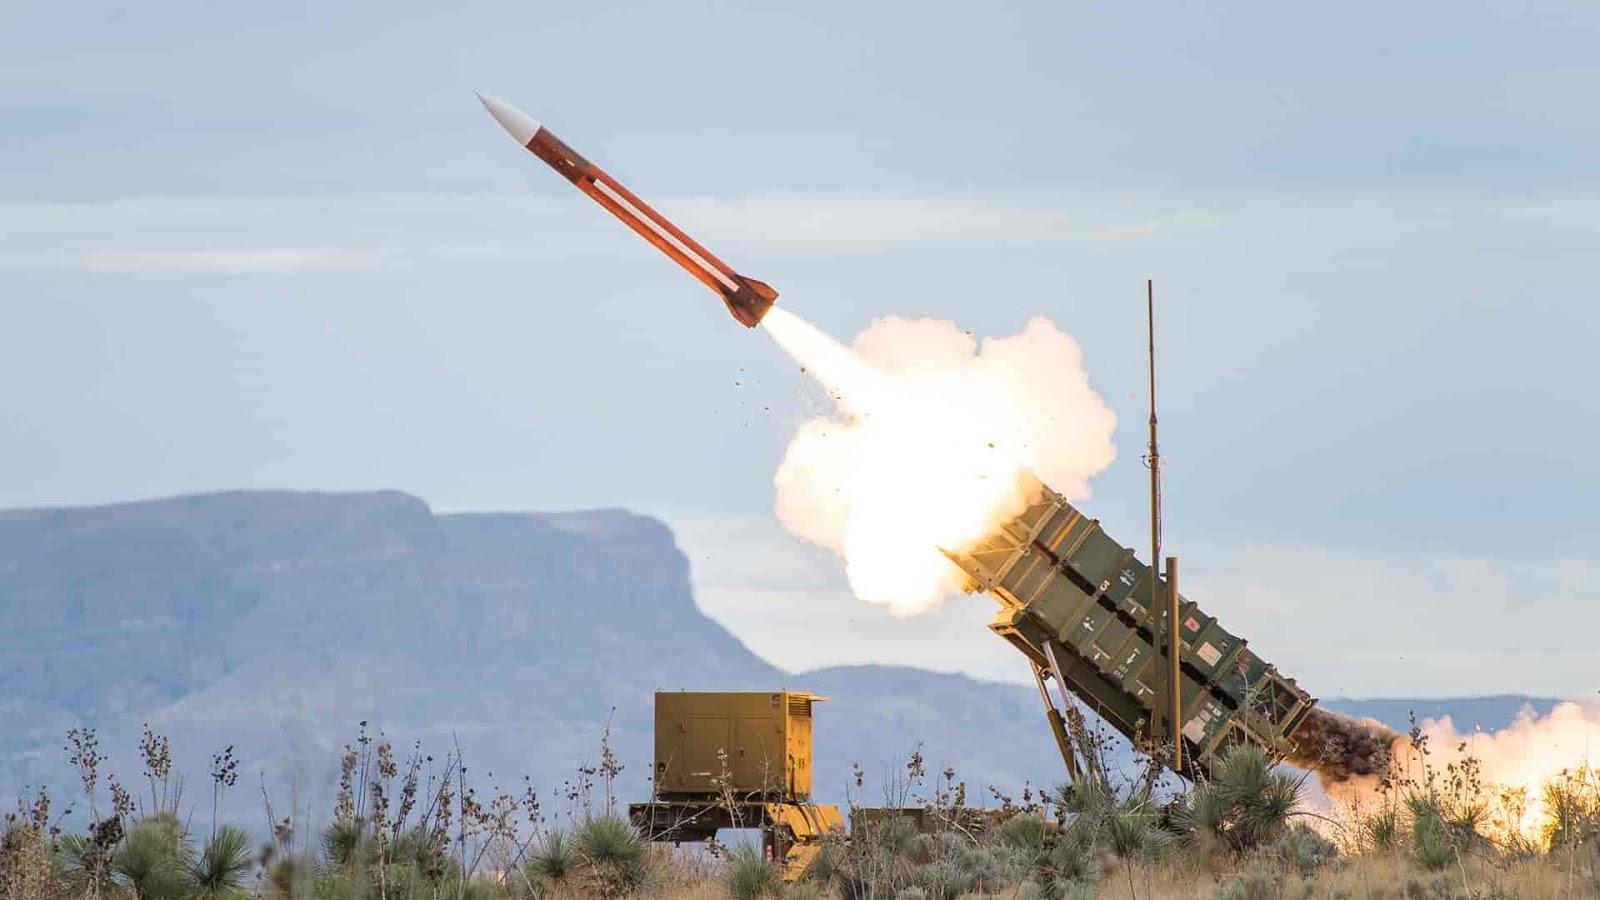 Turki Manfaatkan Konflik AS-Rusia Untuk Dapatkan Rudal S